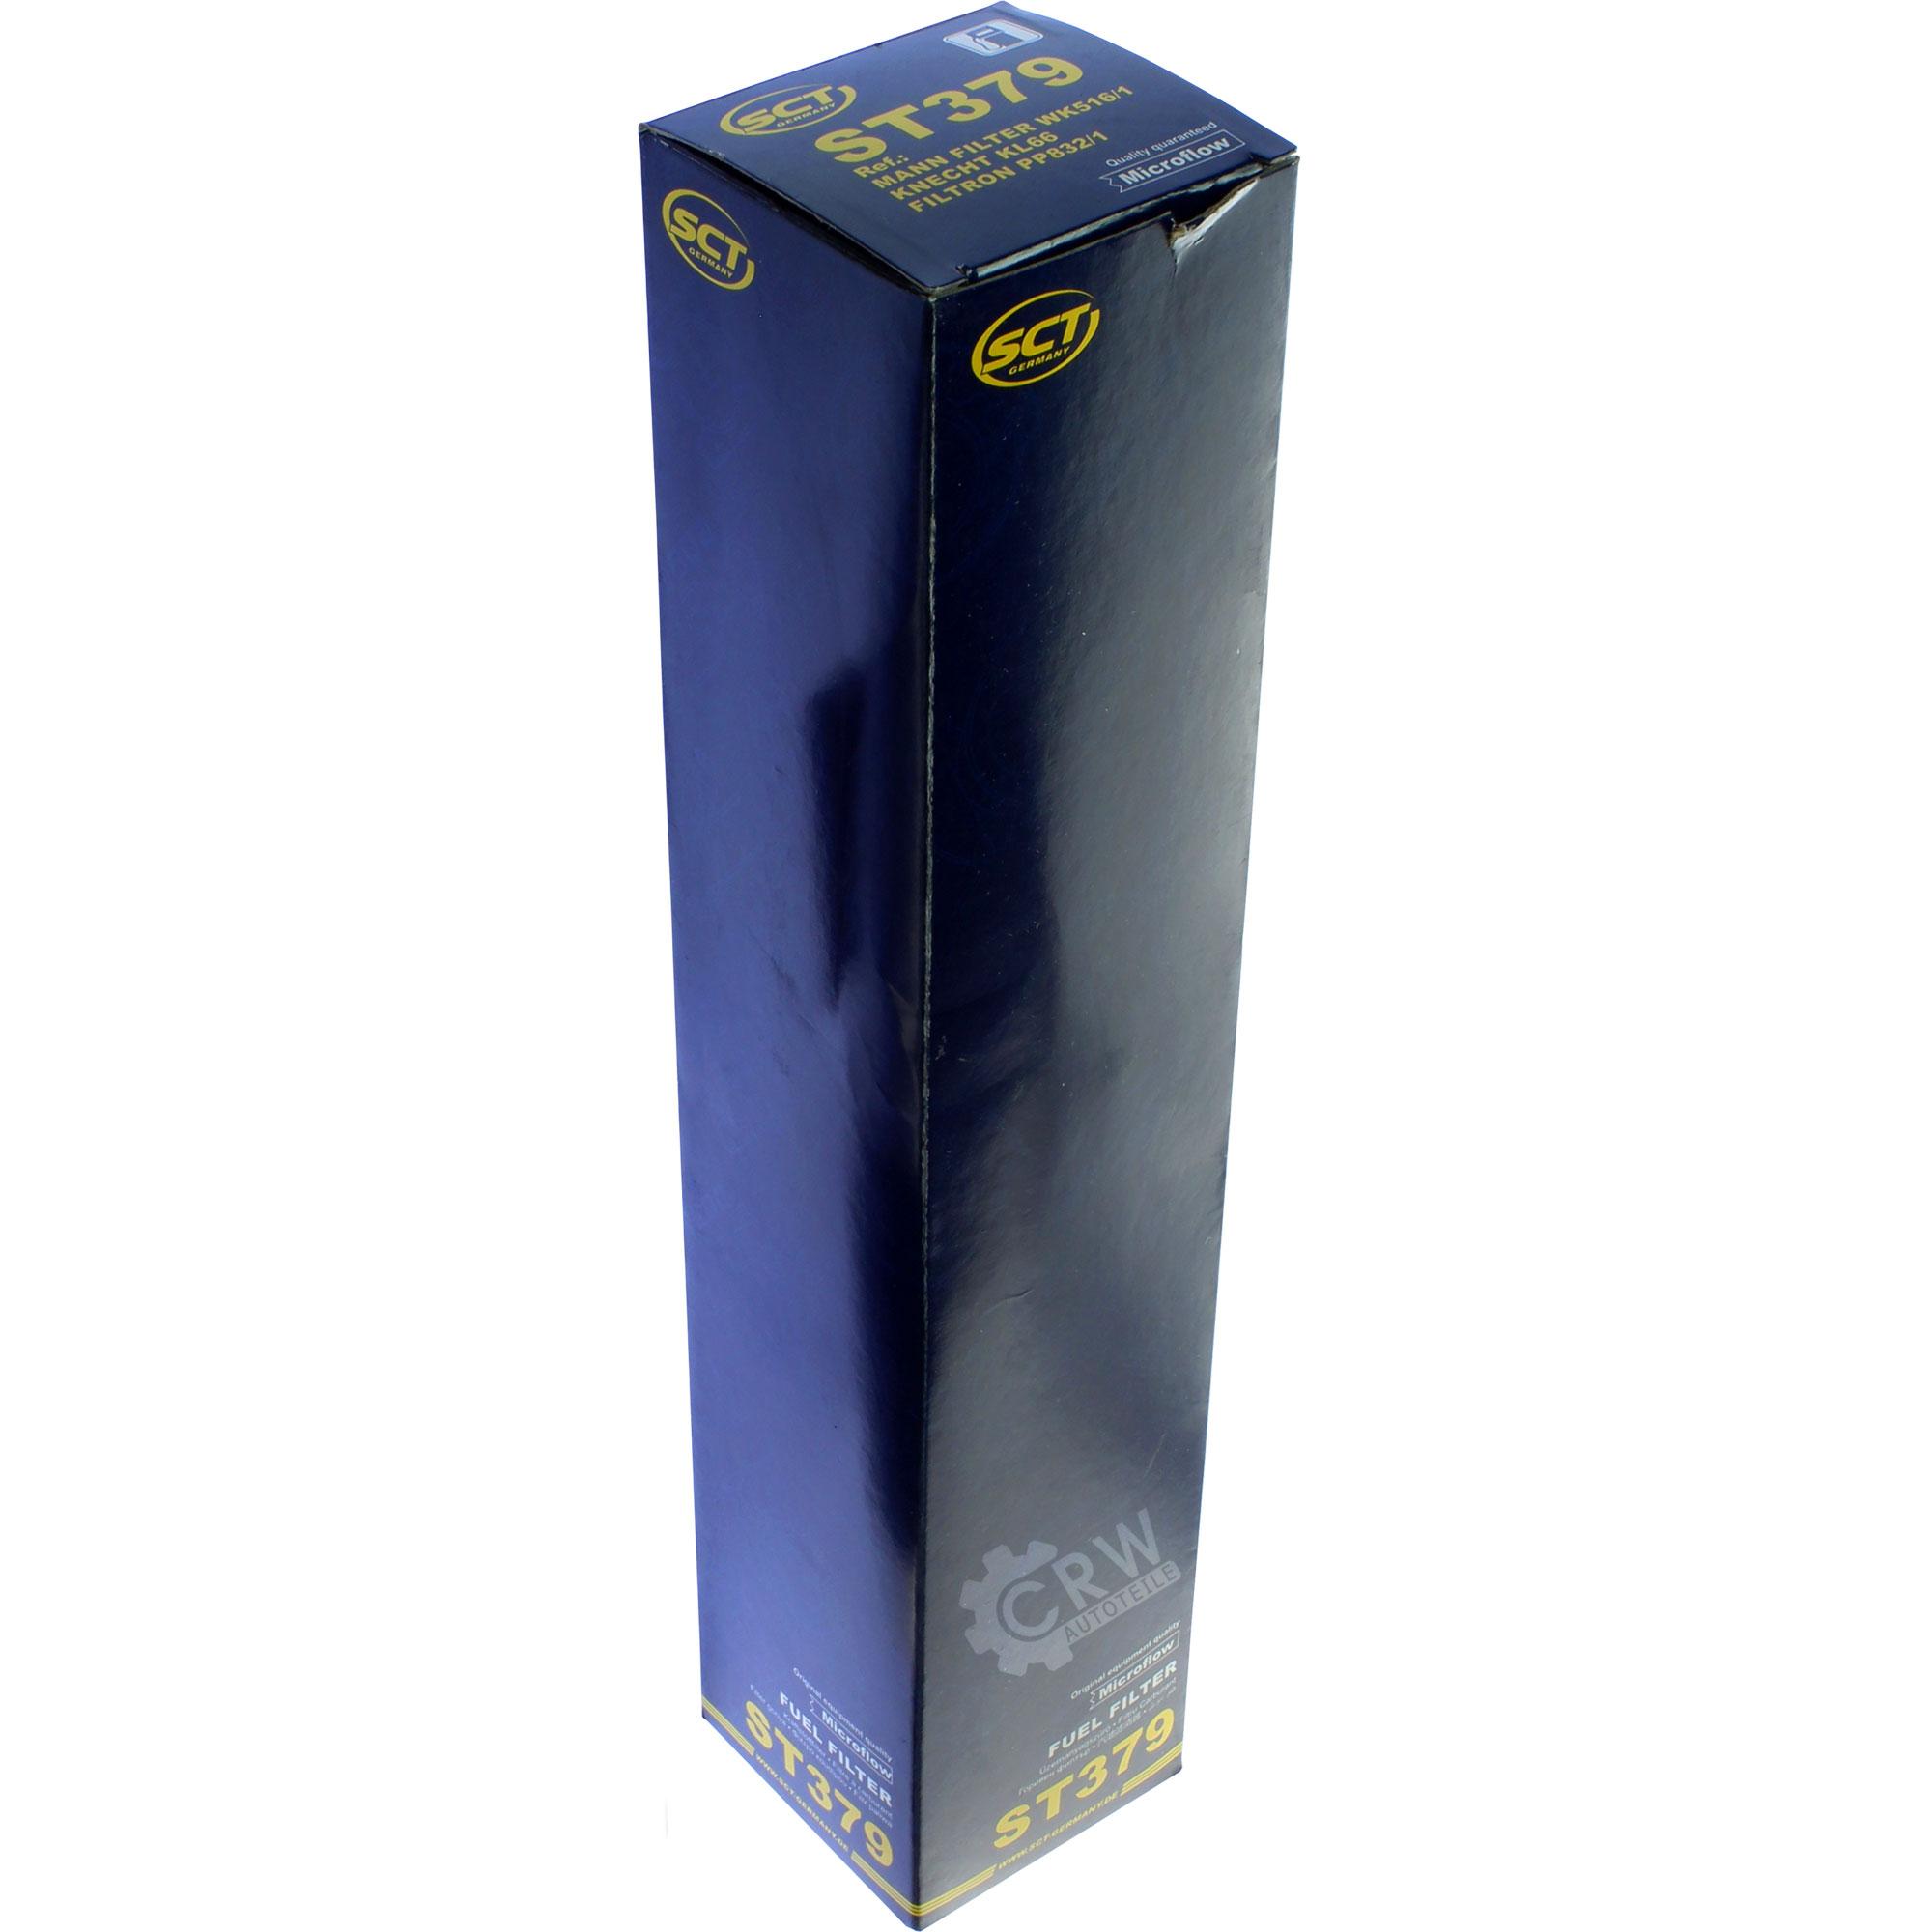 Cambio-de-aceite-set-5l-MANNOL-energy-premium-5w-30-aceite-del-motor-filtro-sct-kit-10140076 miniatura 11